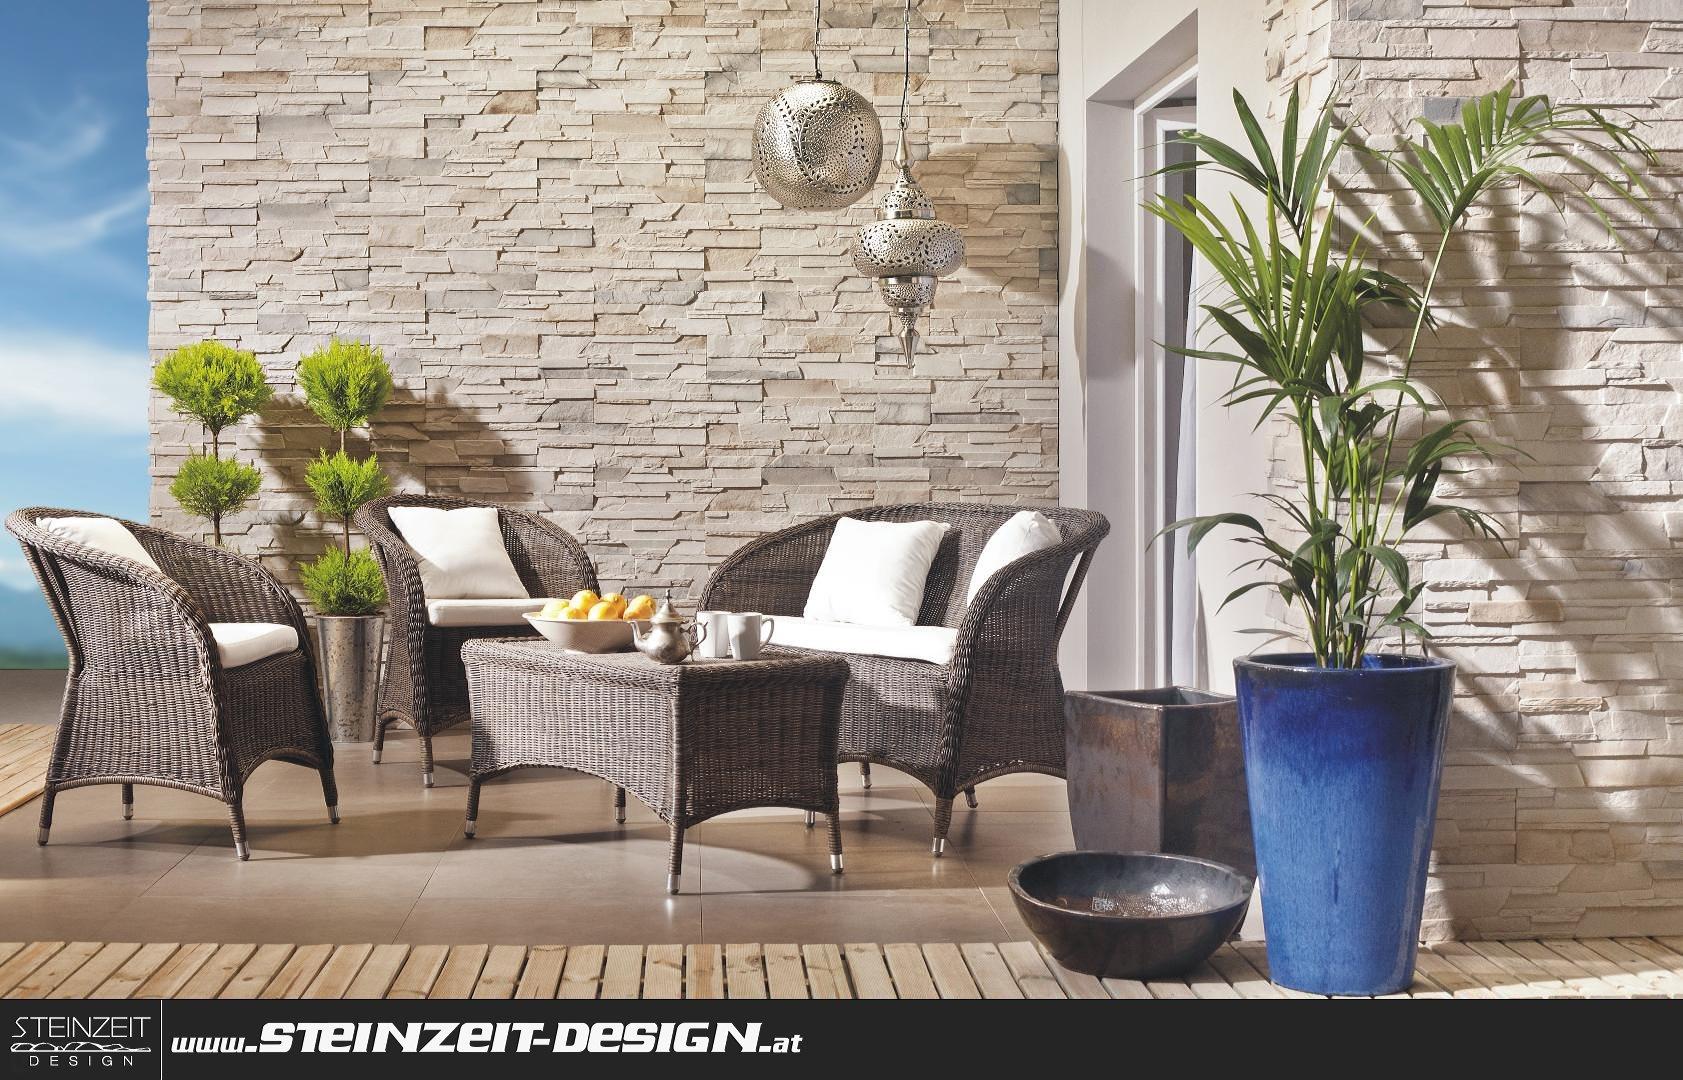 verblendstein stones sakura 1. Black Bedroom Furniture Sets. Home Design Ideas